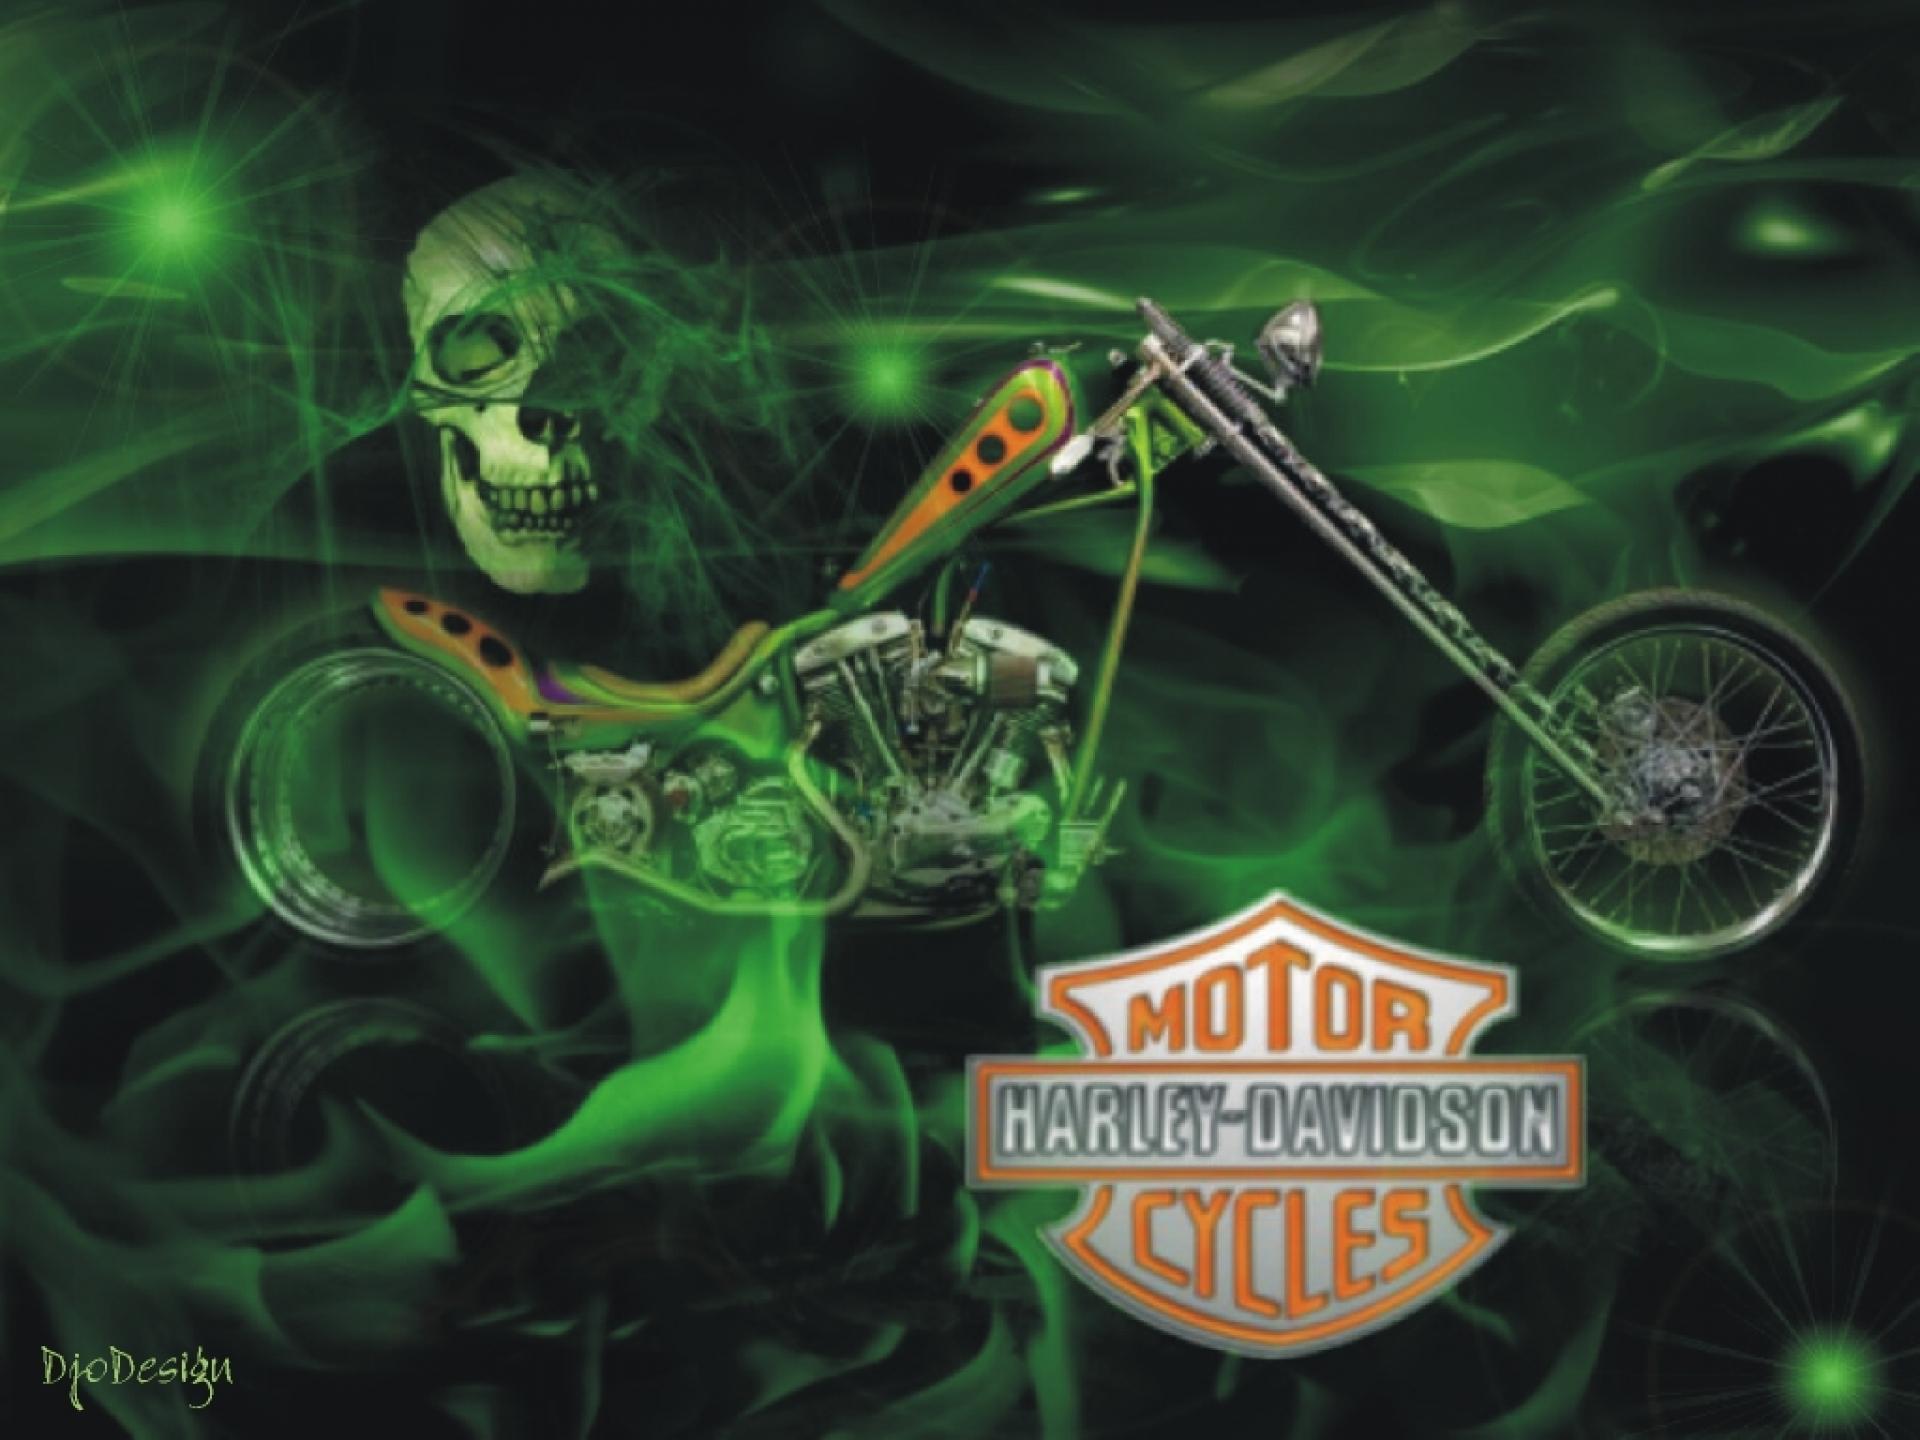 Skull Harley Davidson Green Fire Logo Motorcycle 1201676 19201440 1920x1440